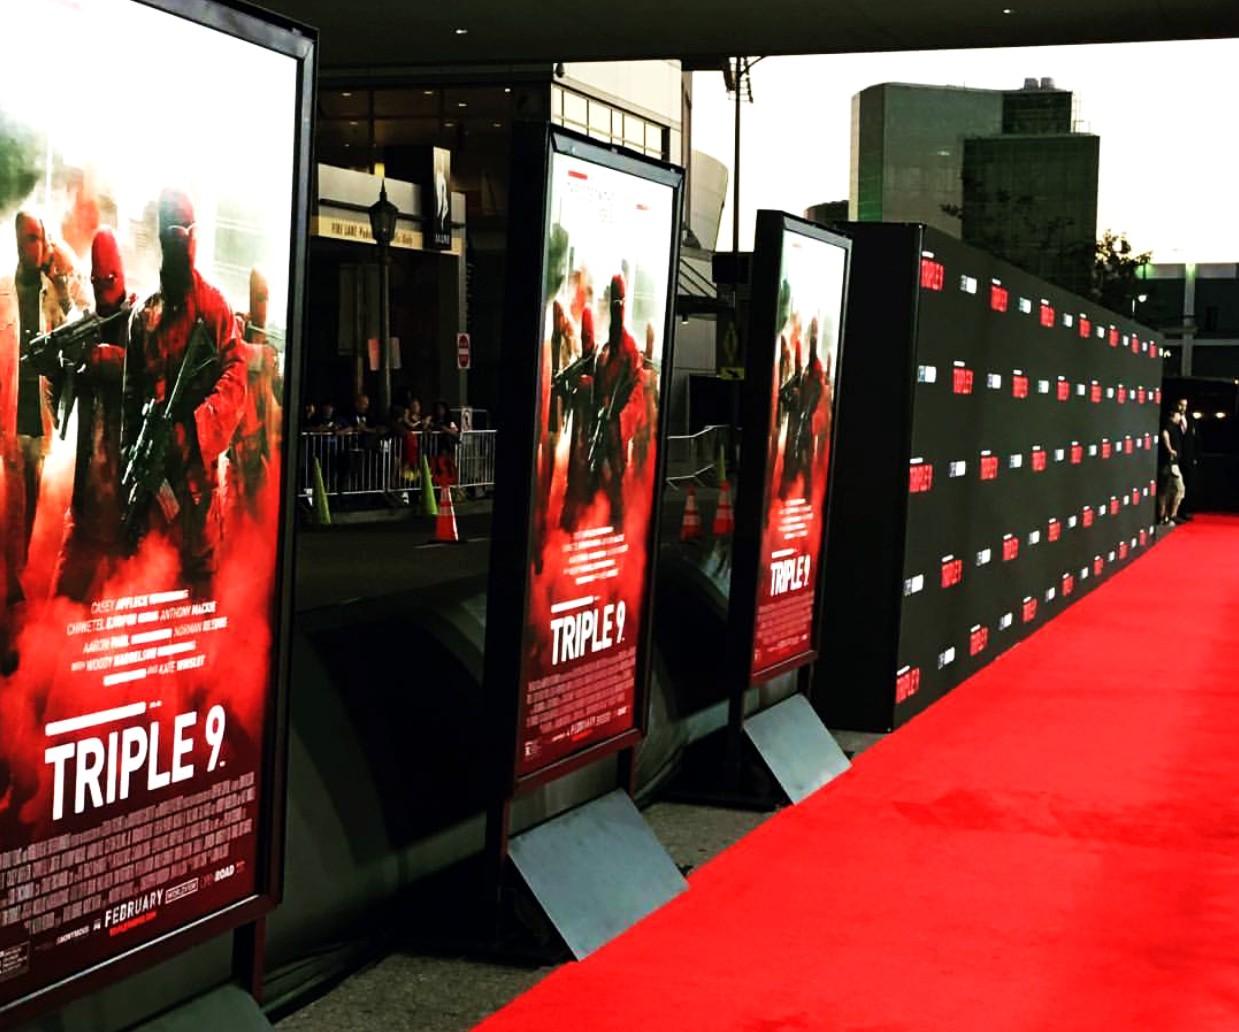 Triple 9, movie premiere, red carpet